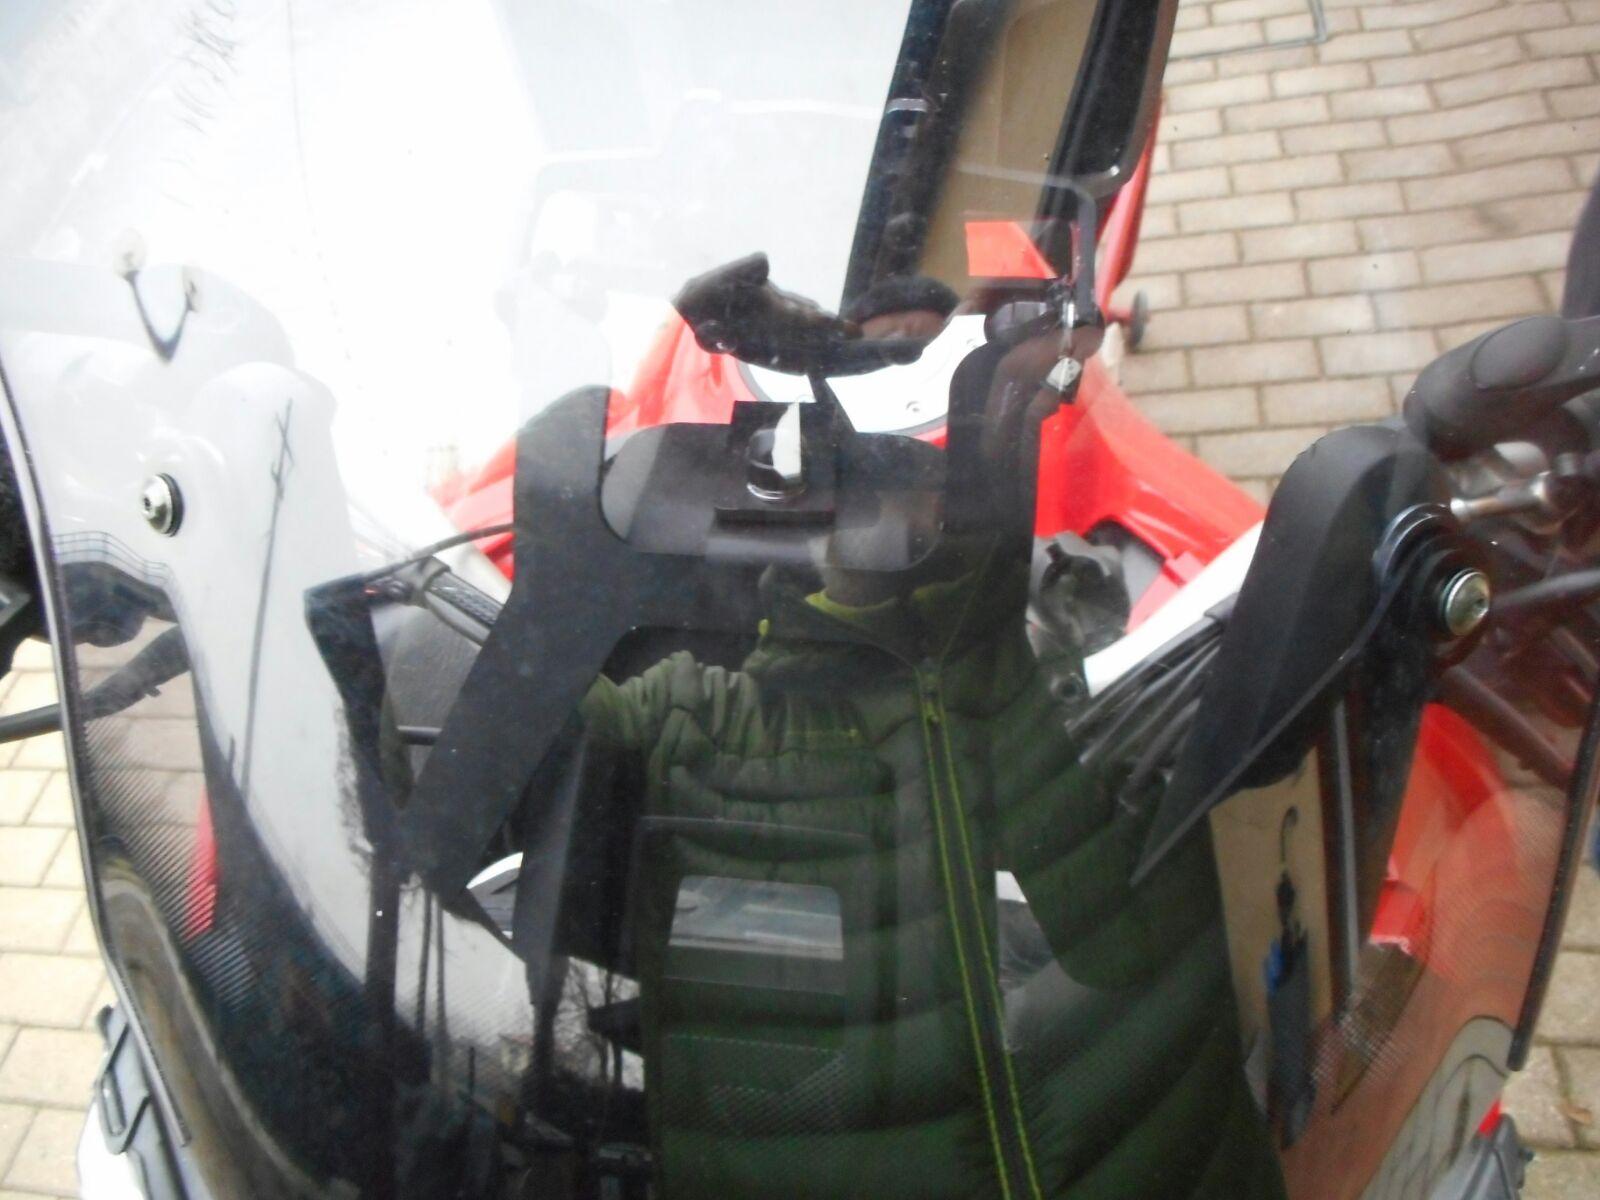 DUCATI MULTISTRADA 950 2017 - GPS/Smartphone Houder